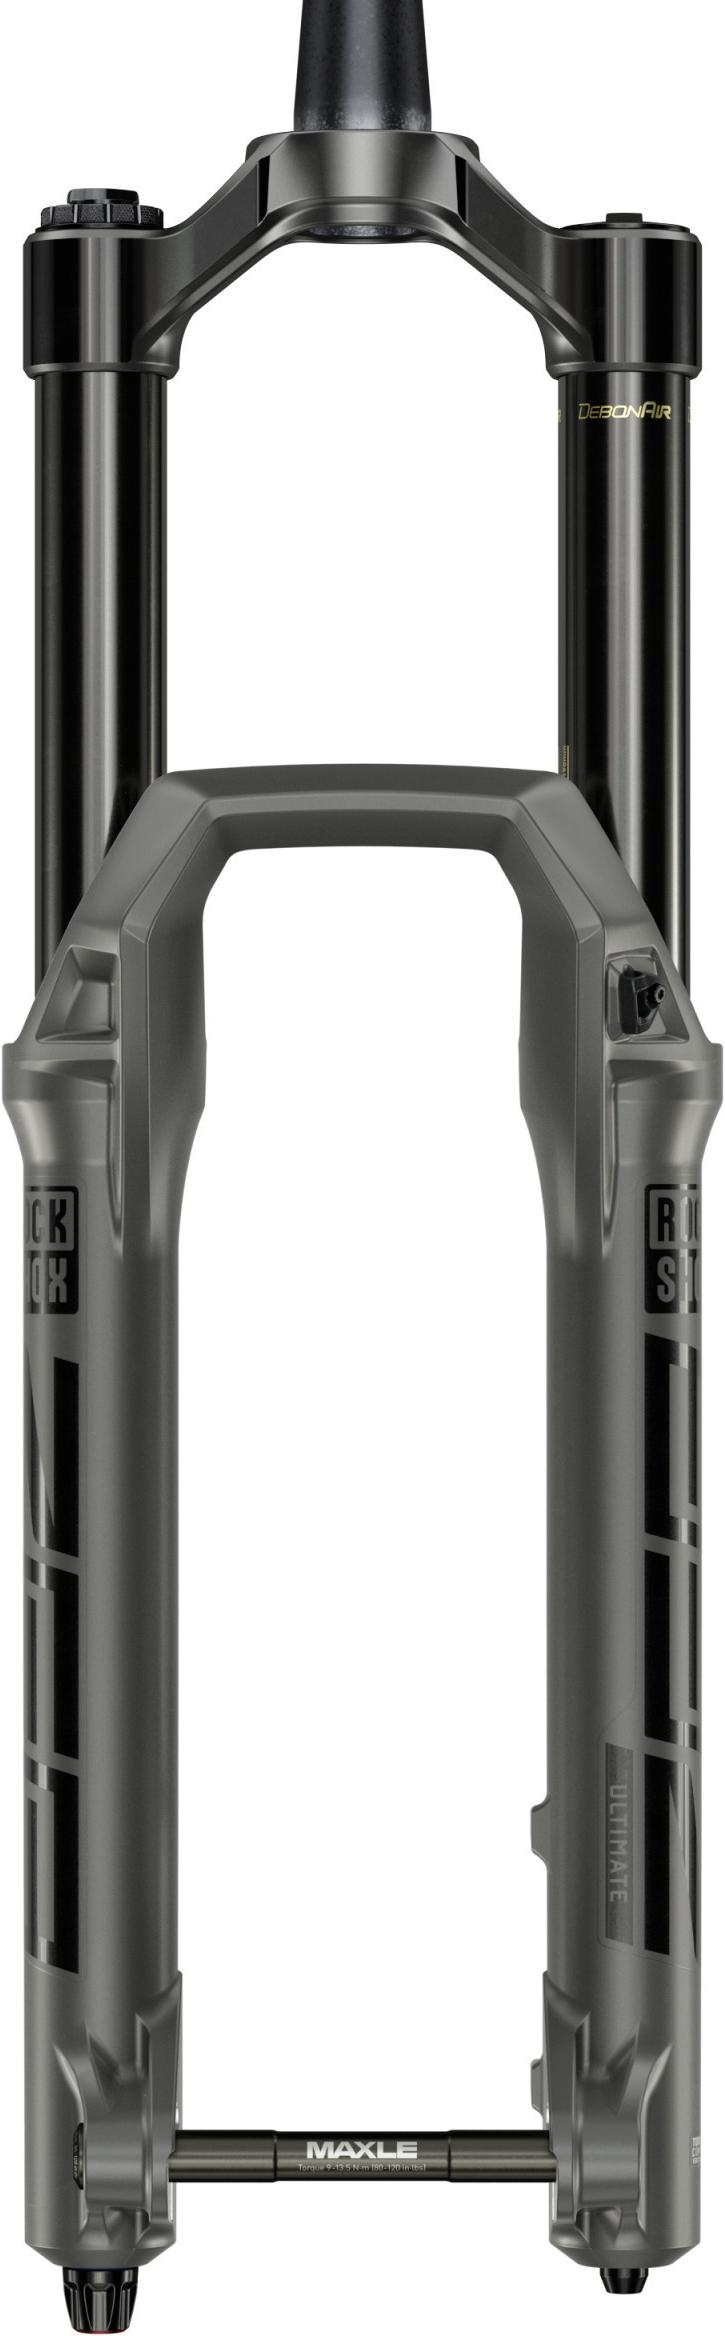 "Rock Shox Zeb Ultimate DebonAir Boost 27.5"" Federgabel grau | Modell 2021"